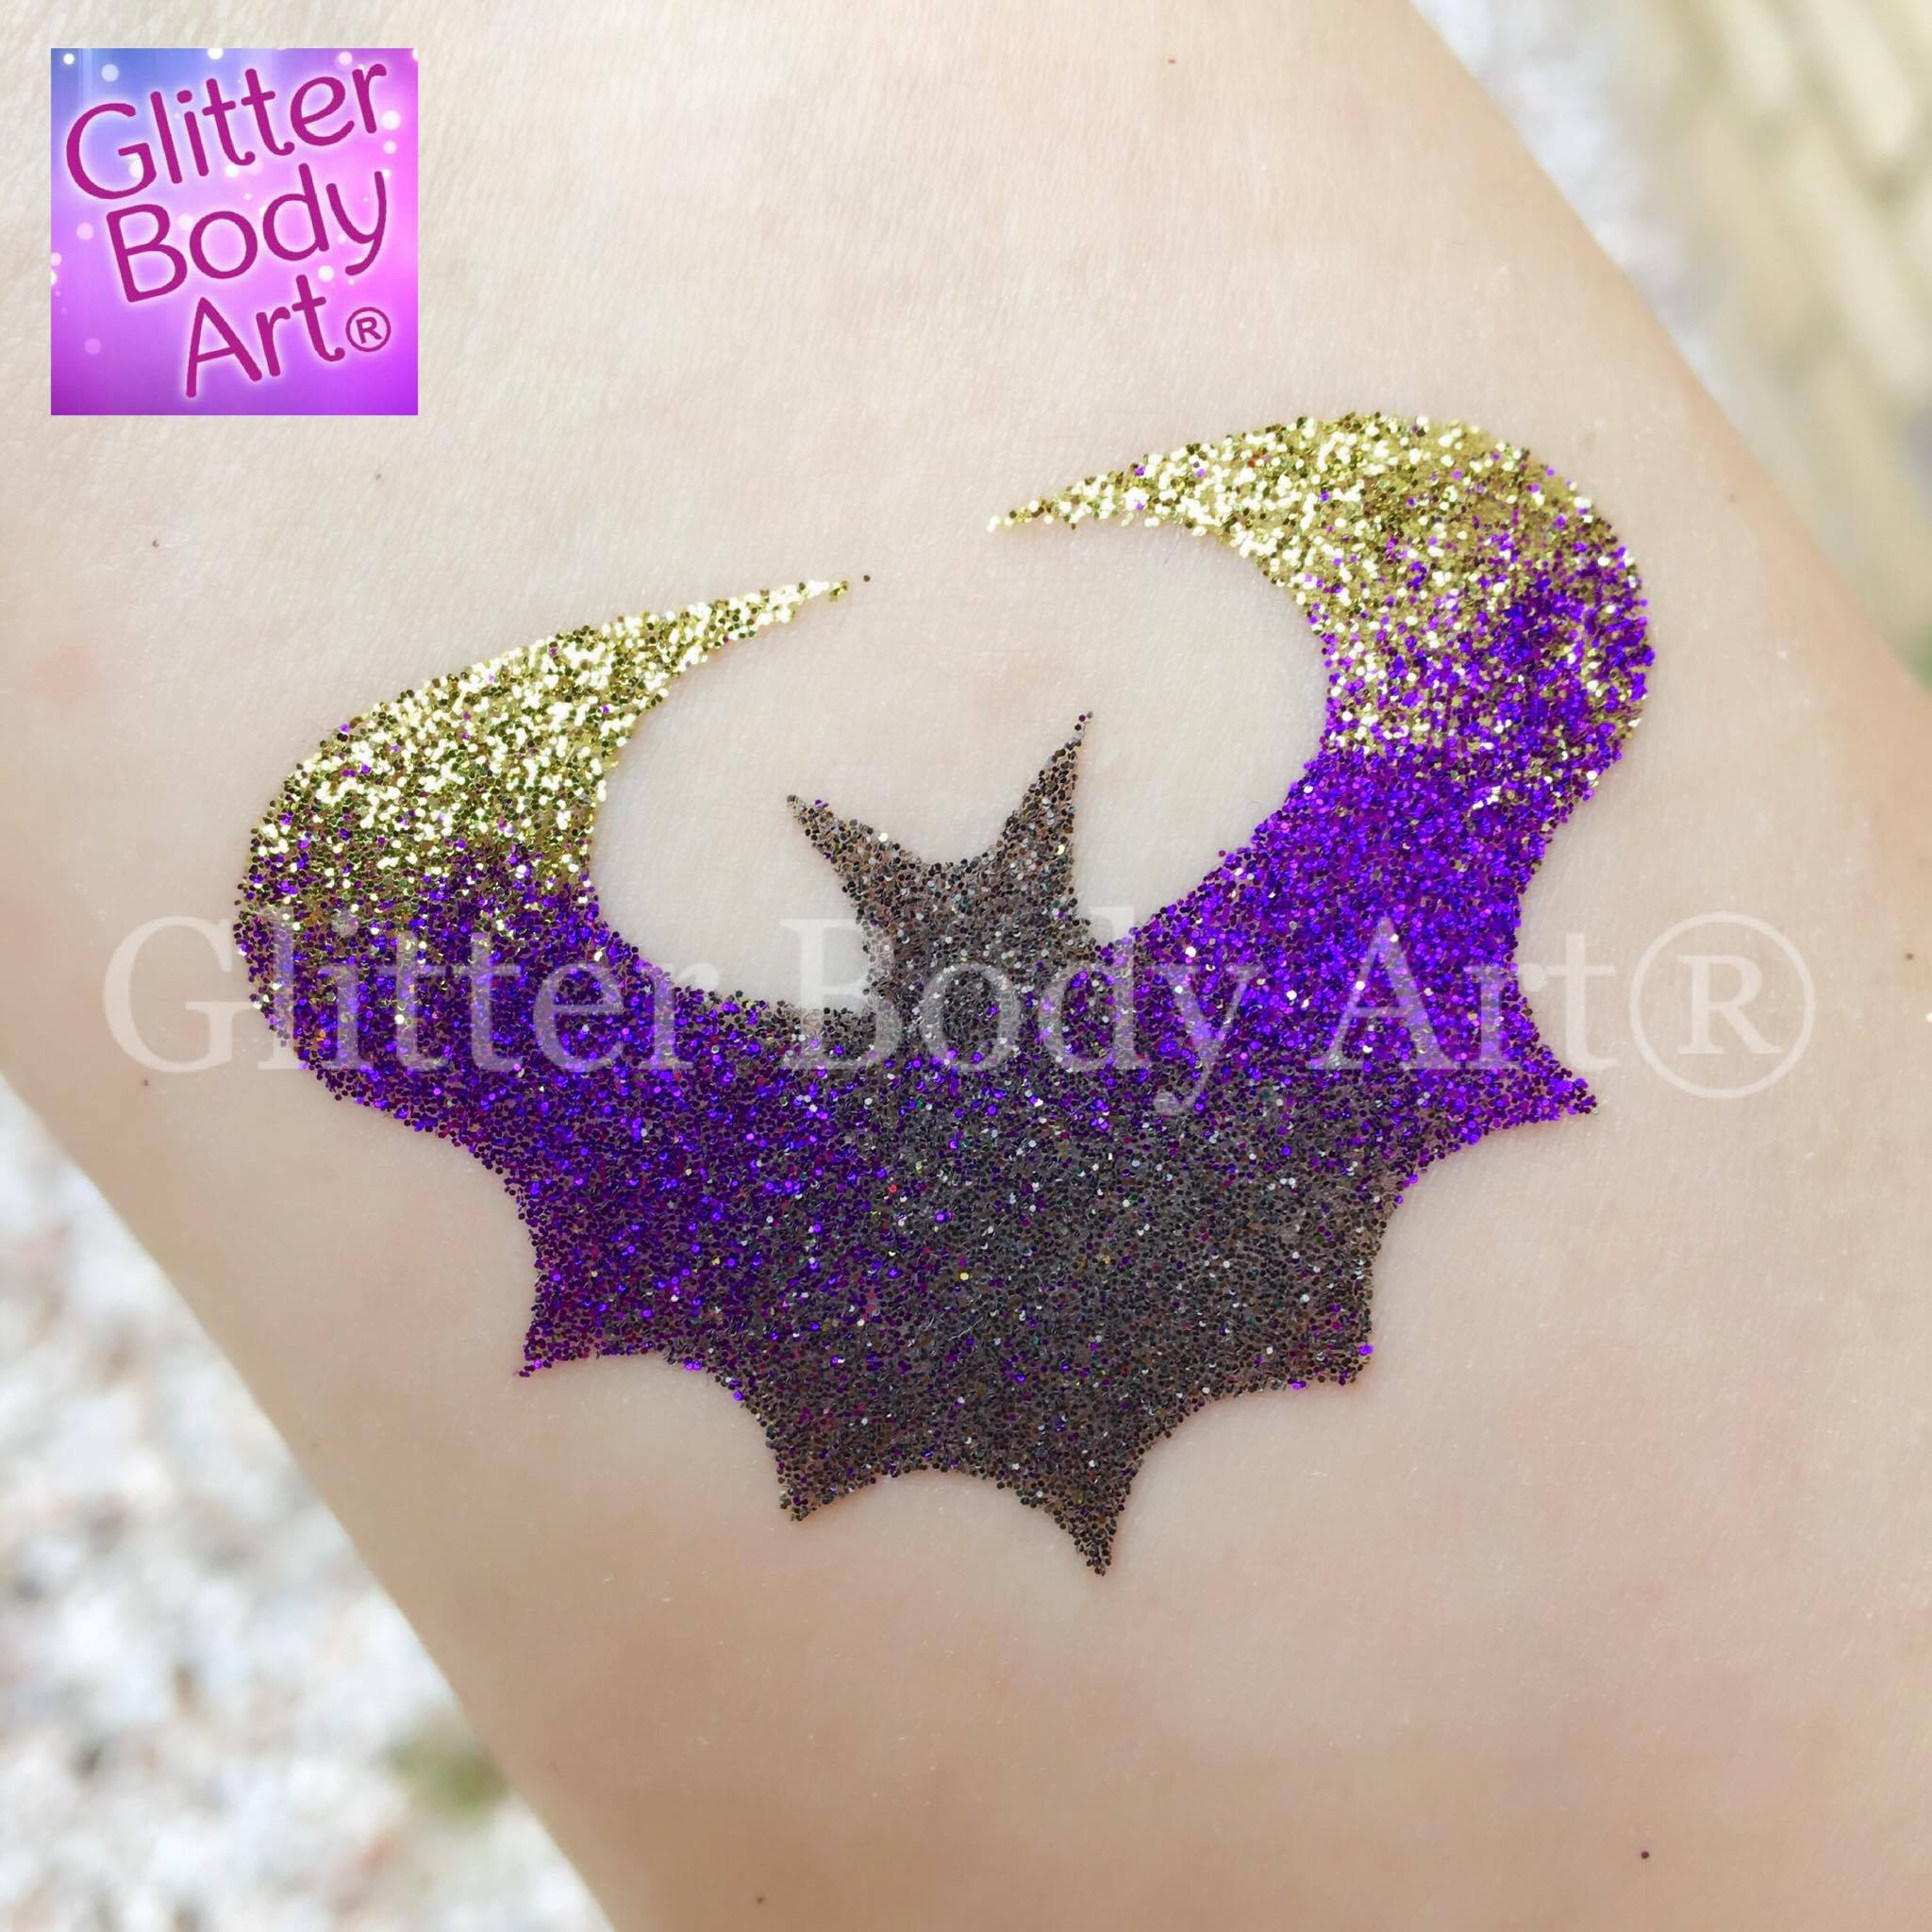 bat temporary tattoo stencil, batman glitter tattoos for boys birthday party idea